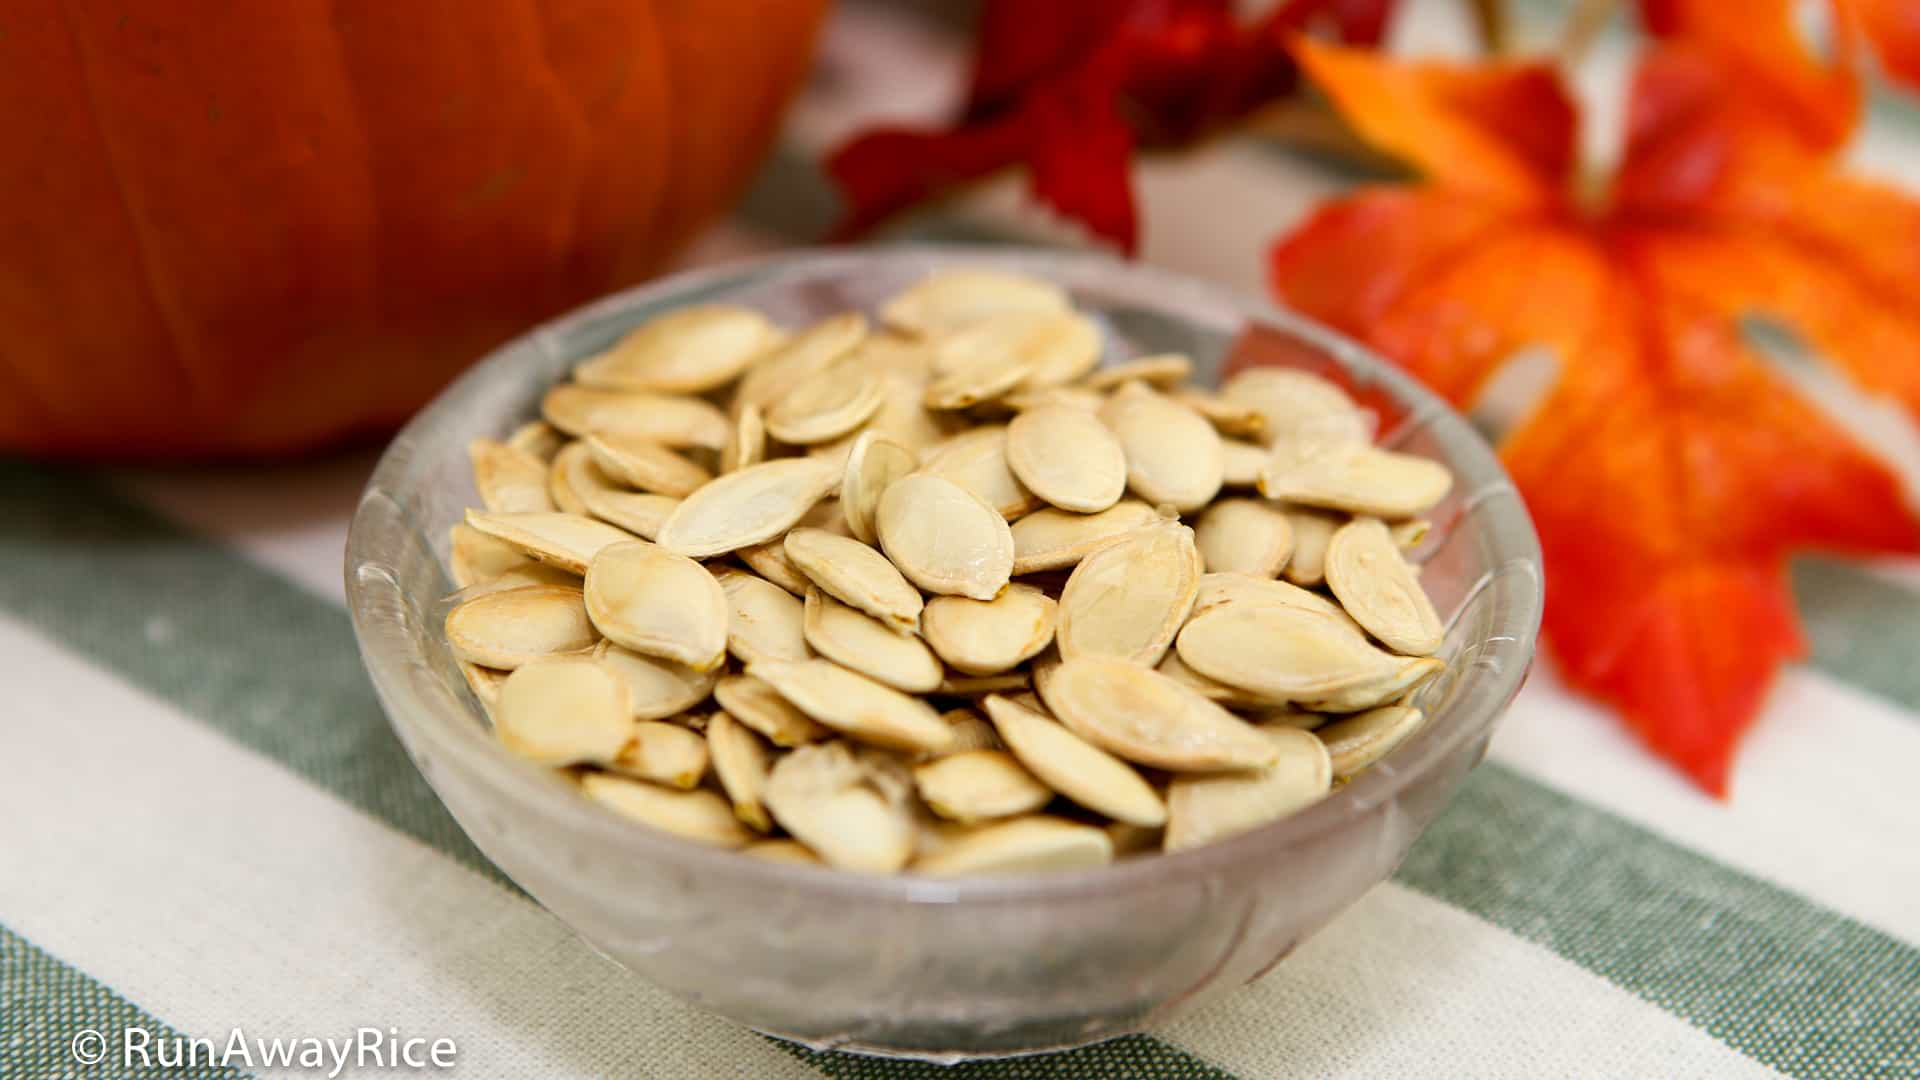 How to Roast Pumpkin Seeds | recipe from runawayrice.com